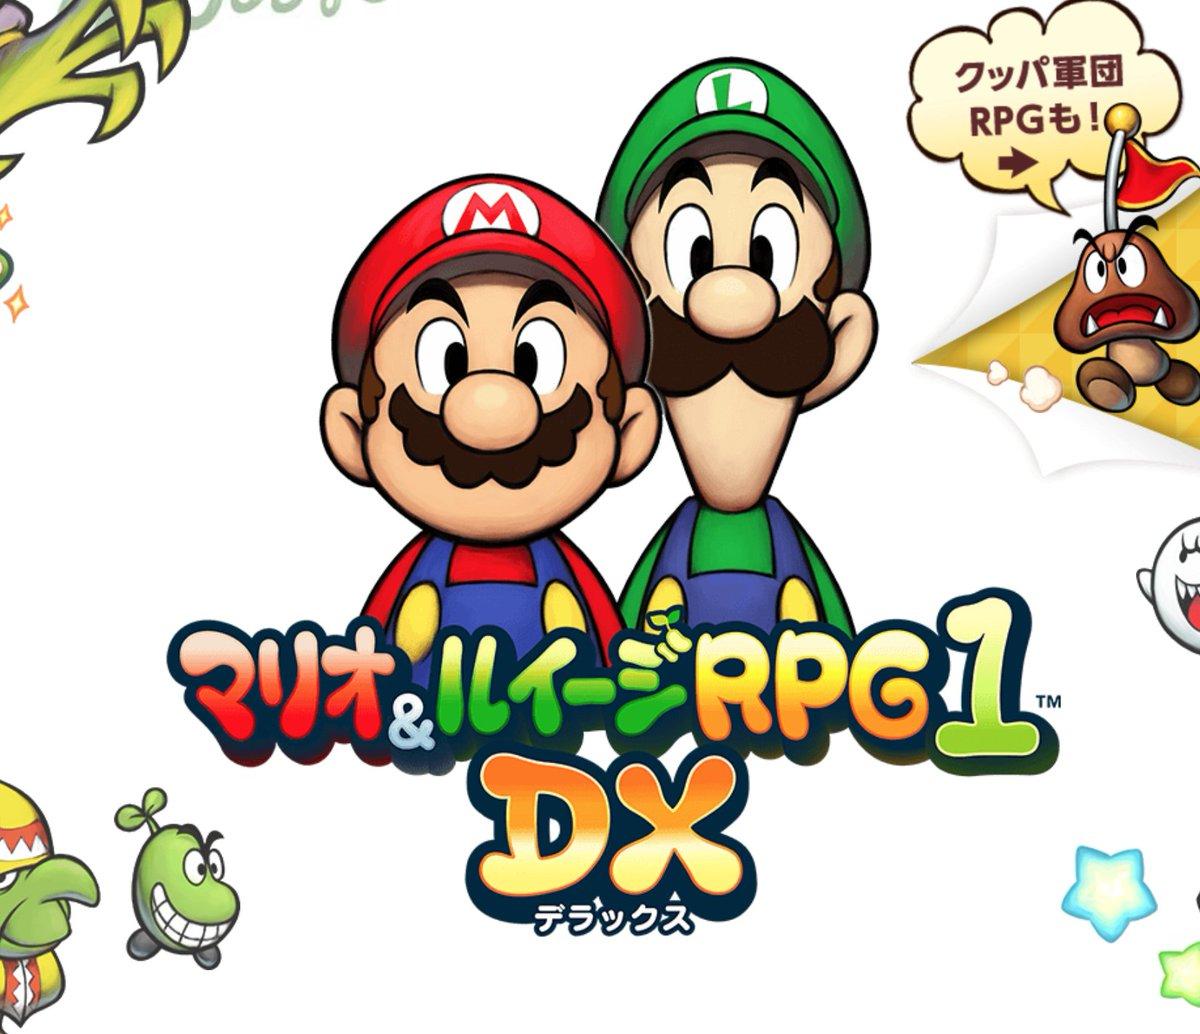 Nick Robinson On Twitter For Comparison S Sake Nintendo Of Japan